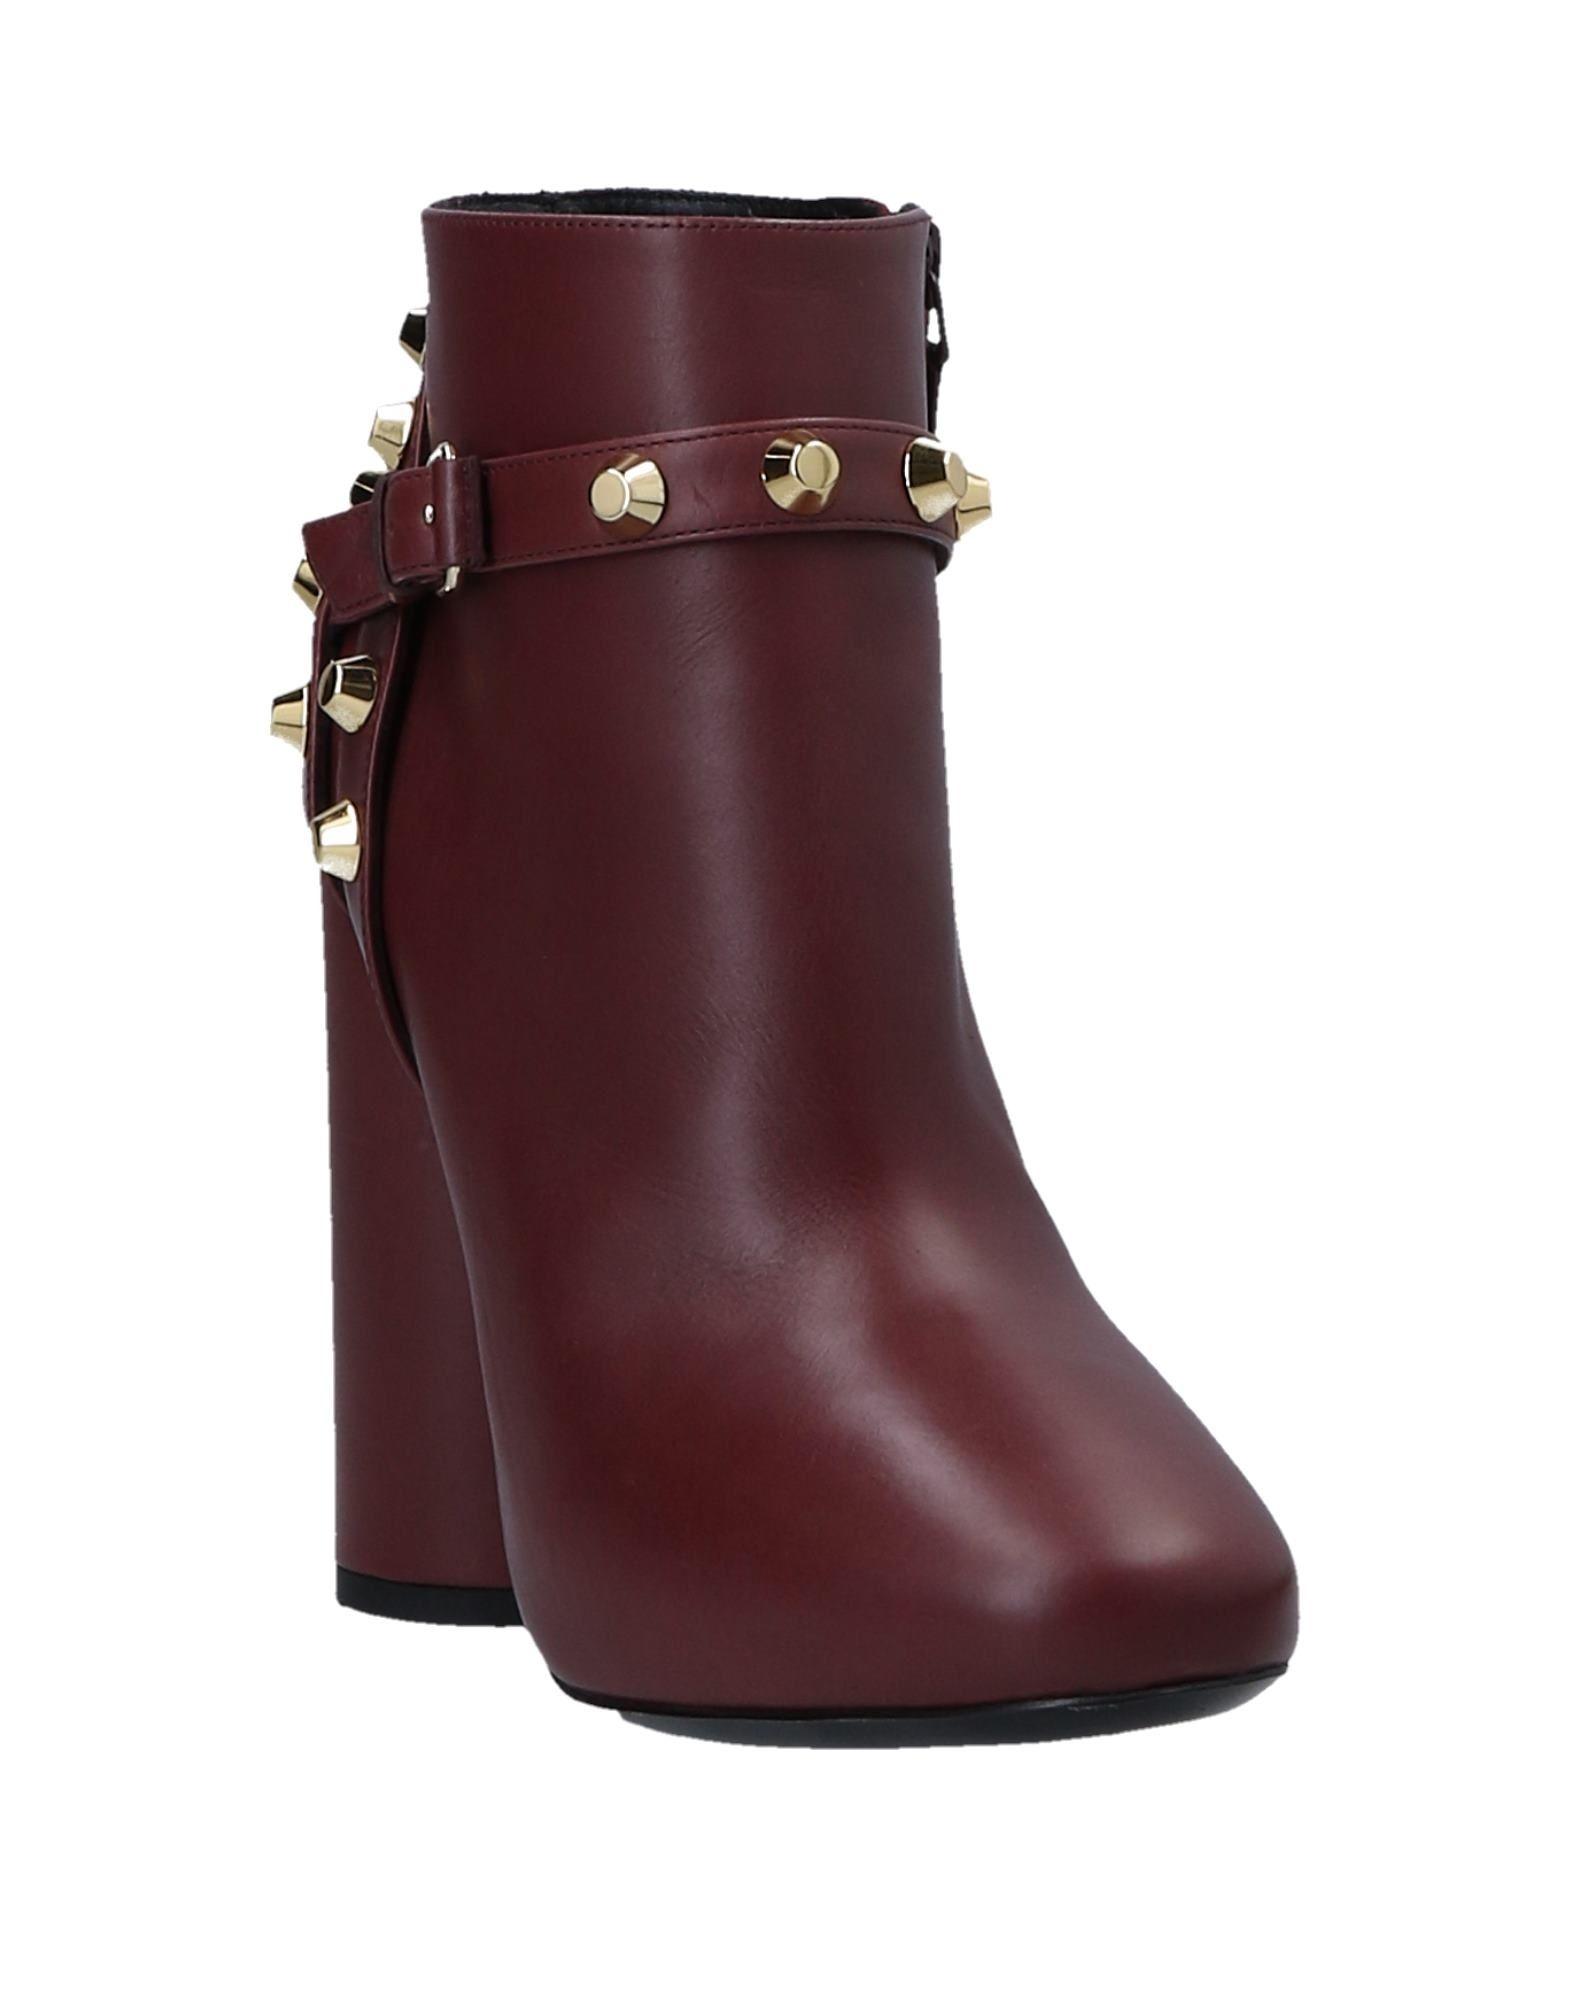 Balenciaga Stiefelette Damen Schuhe  11438605PBGünstige gut aussehende Schuhe Damen 870944